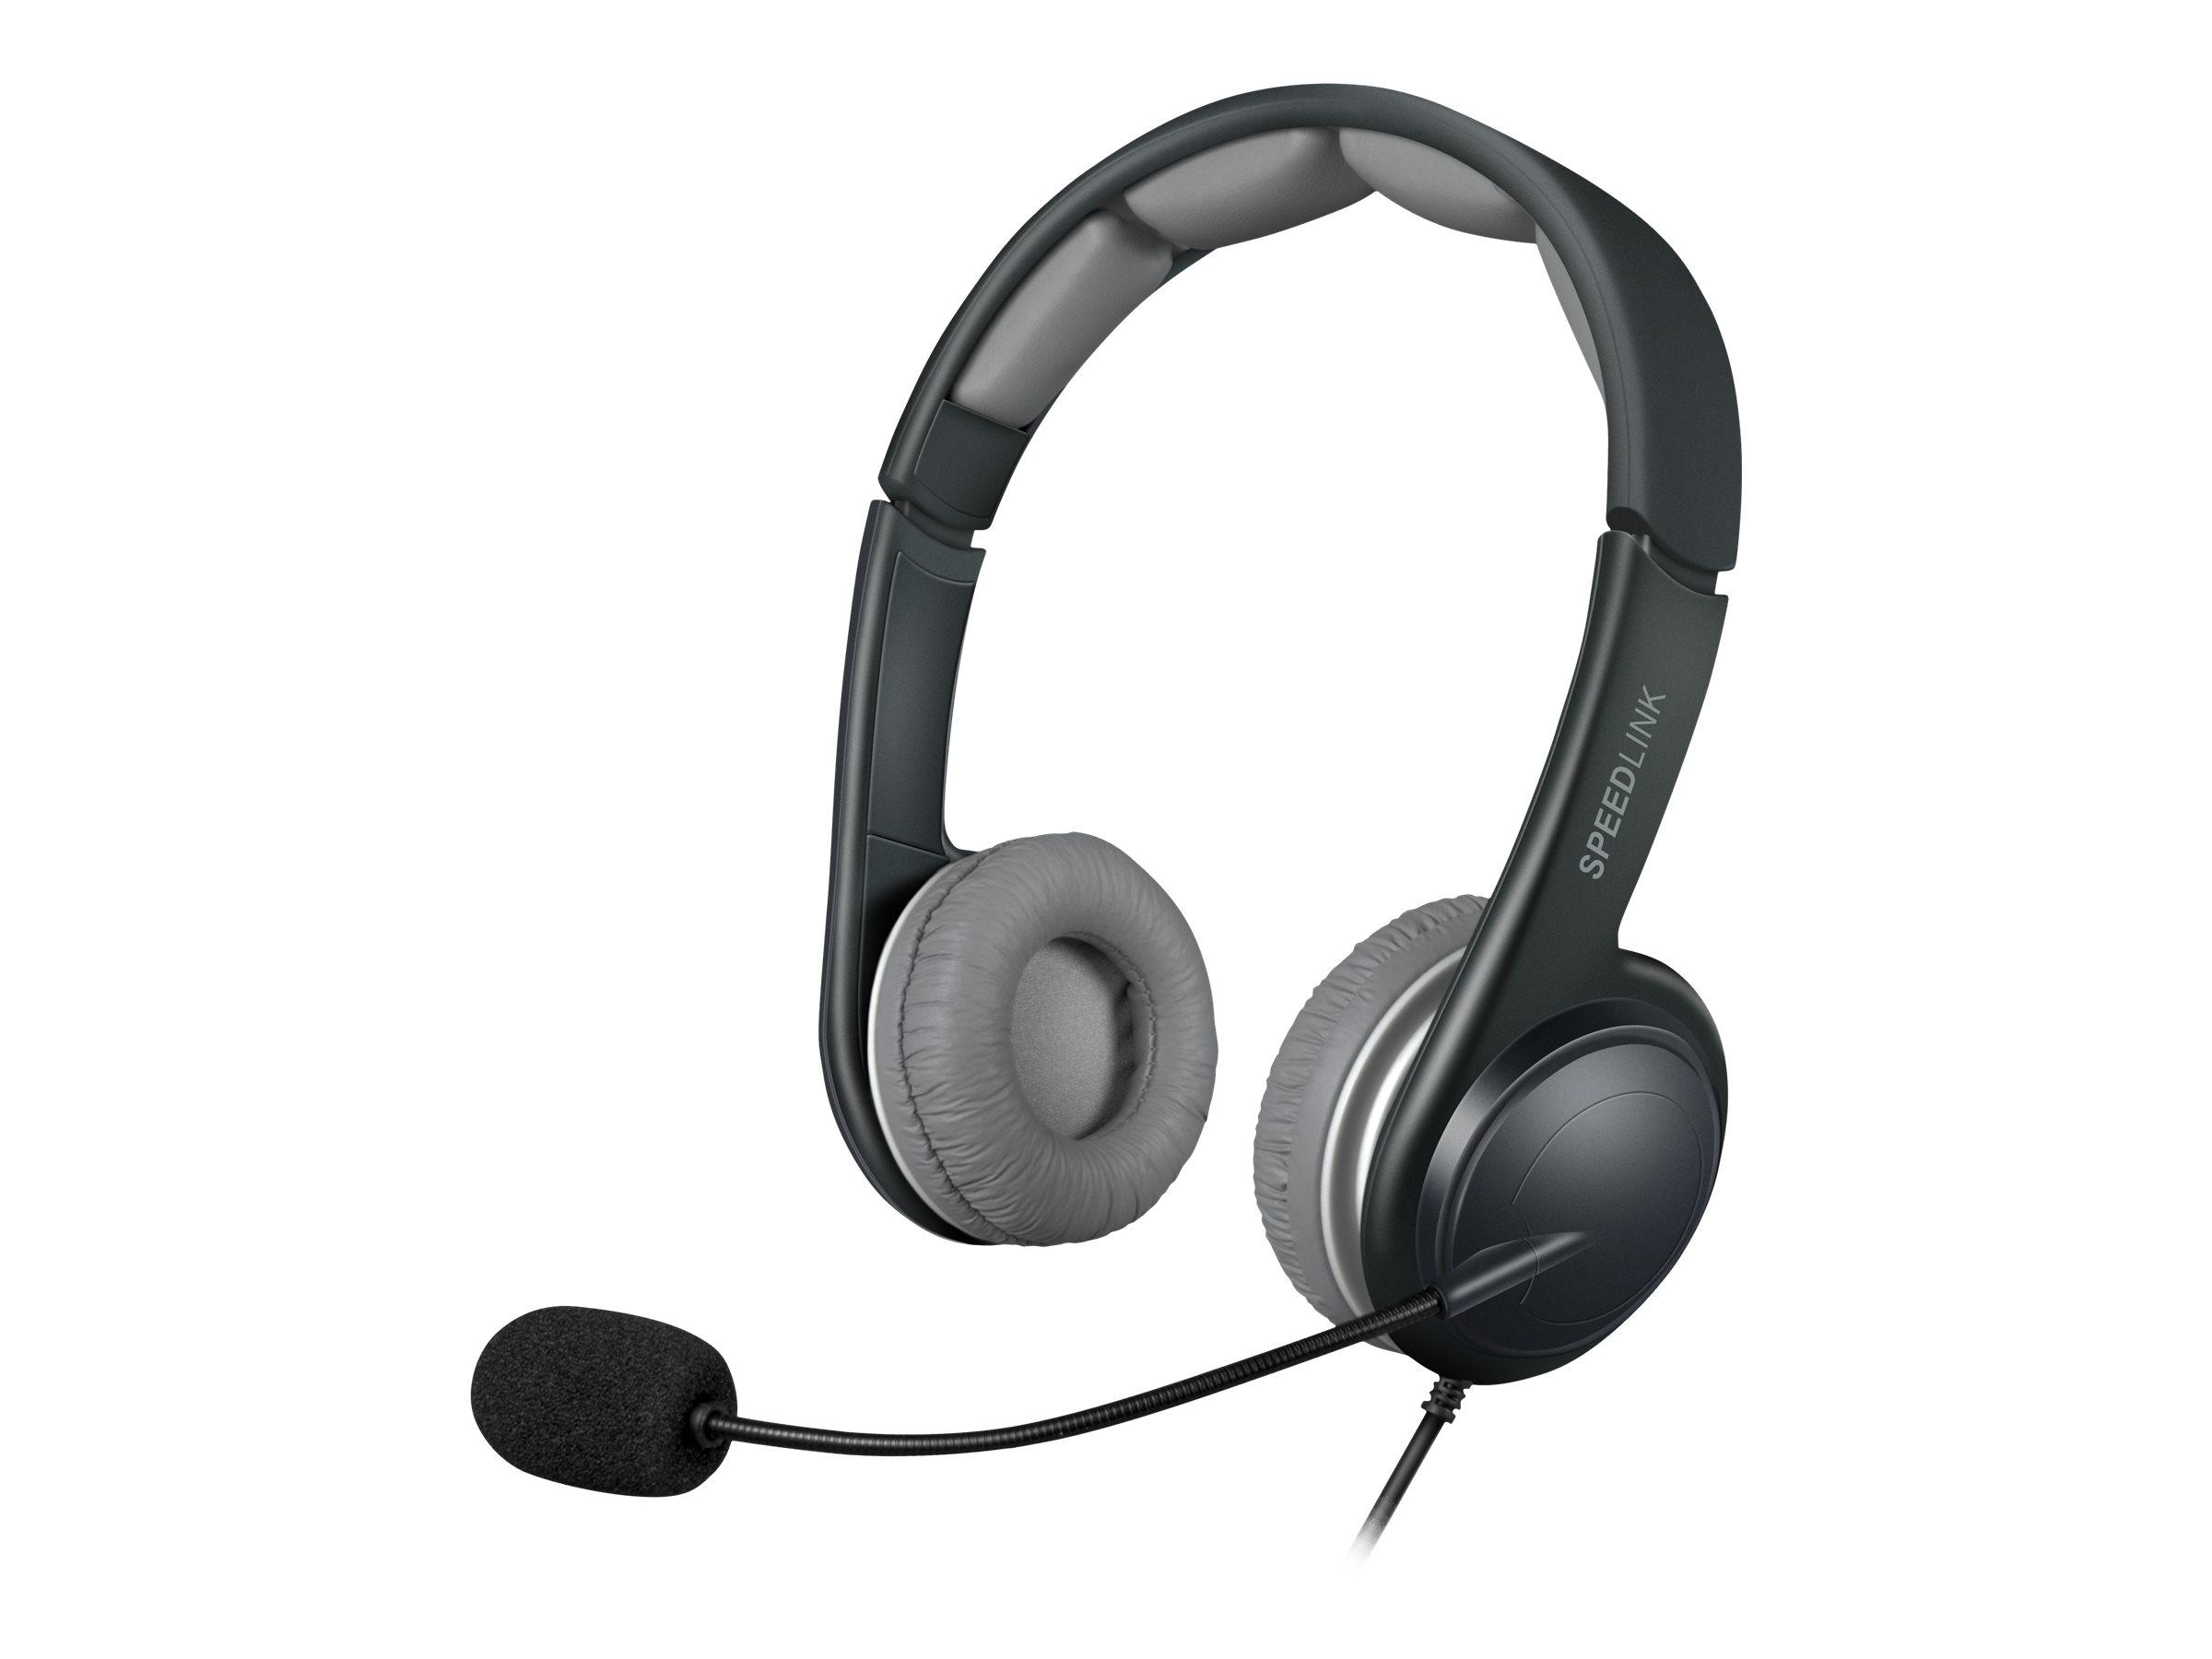 SPEEDLINK SONID - Headset - On-Ear - kabelgebunden - USB - Grau, Schwarz